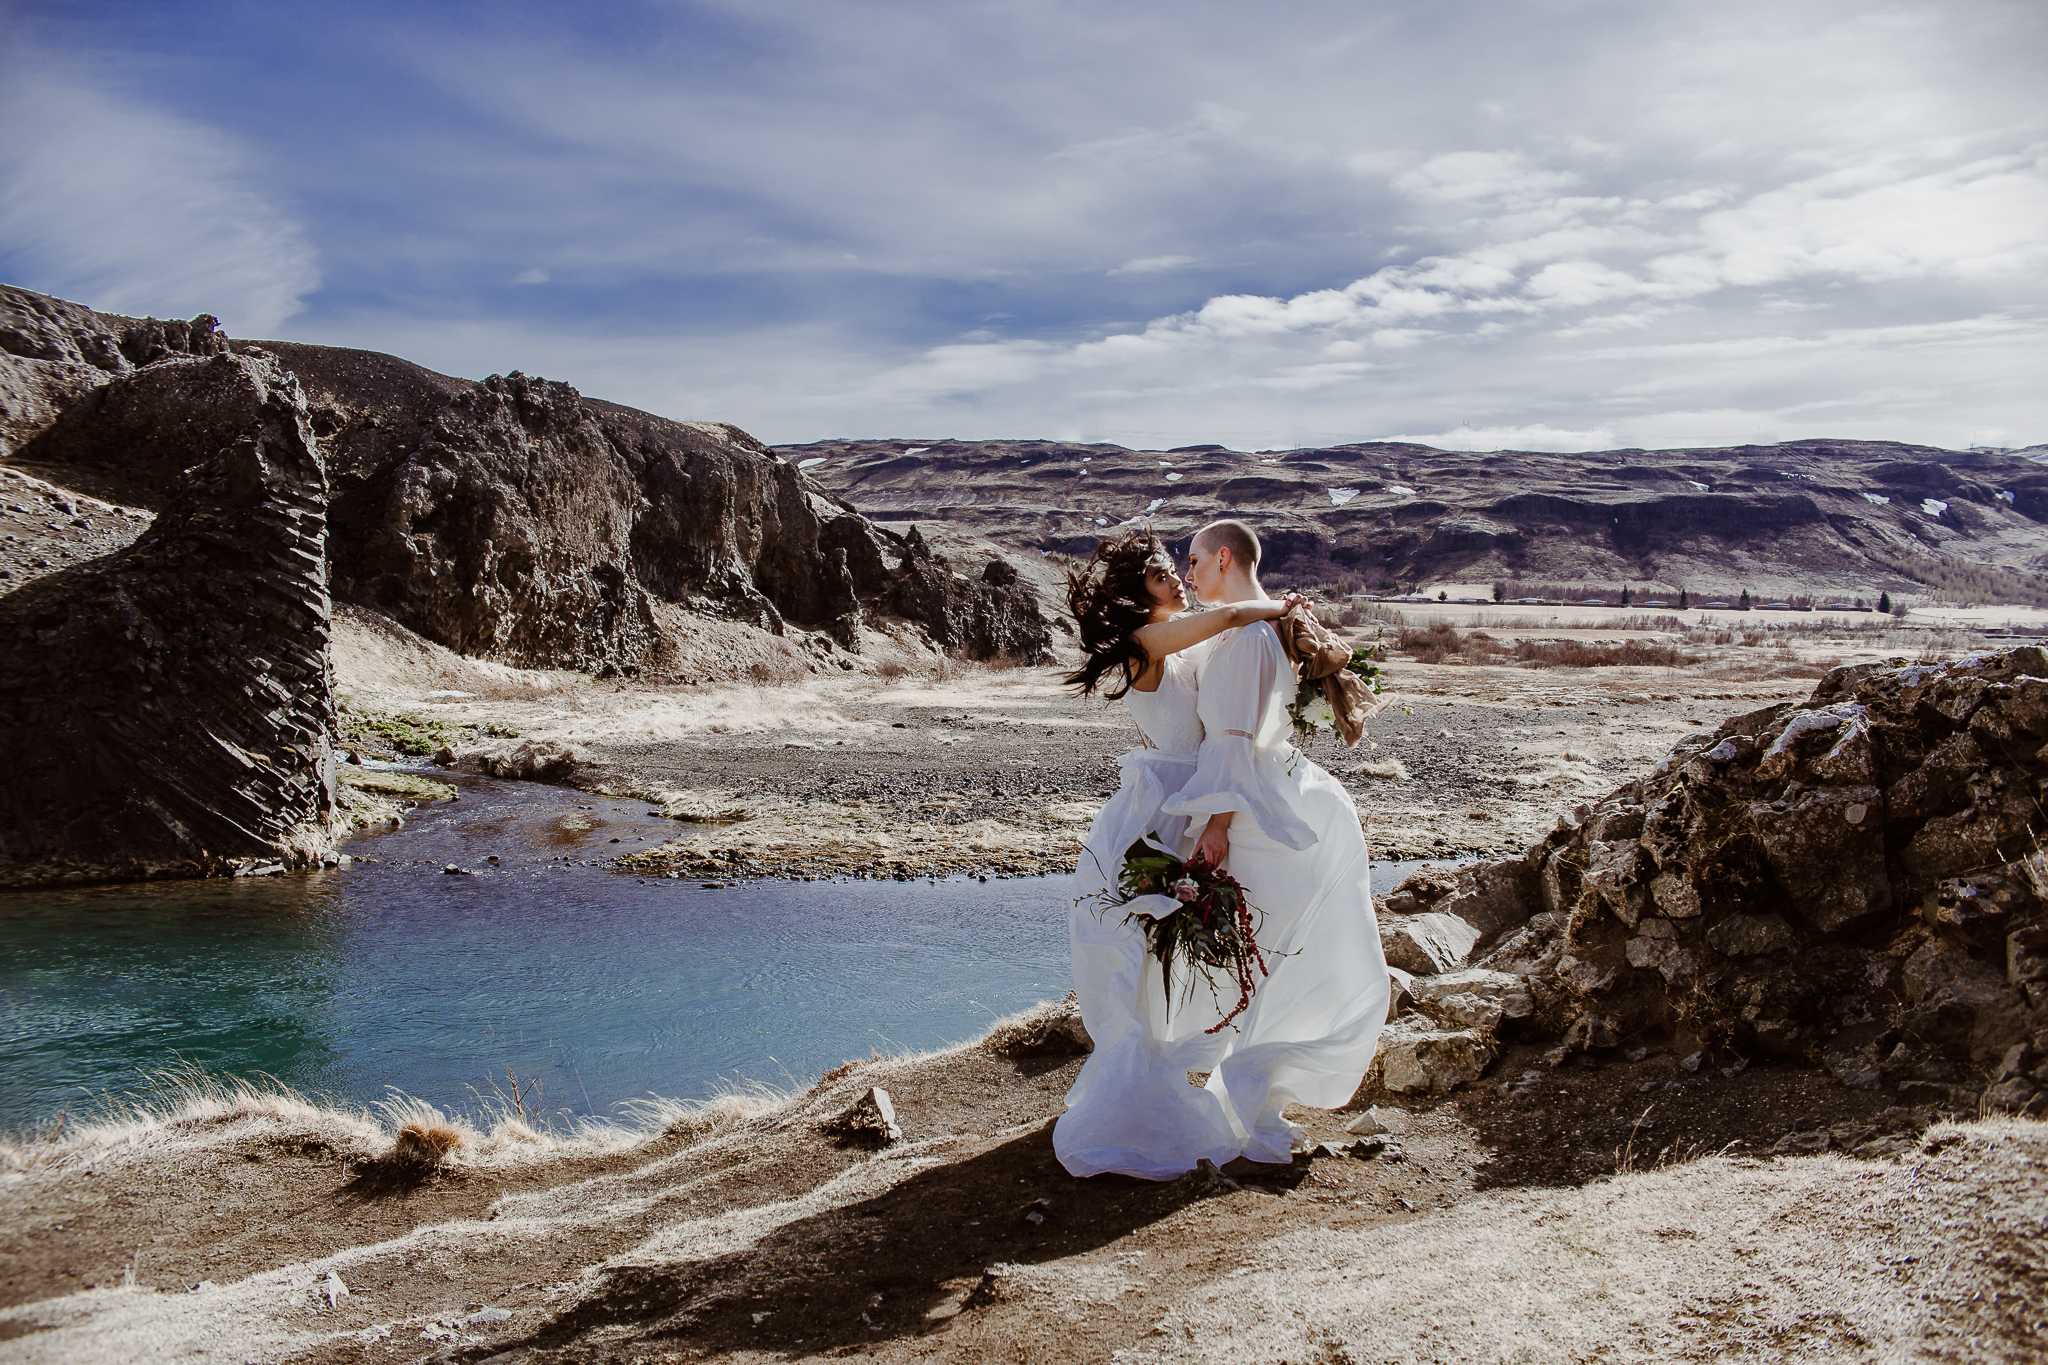 iceland elopement photographer | iceland wedding photographer | iceland wedding pictures | iceland lgtbq wedding pictures